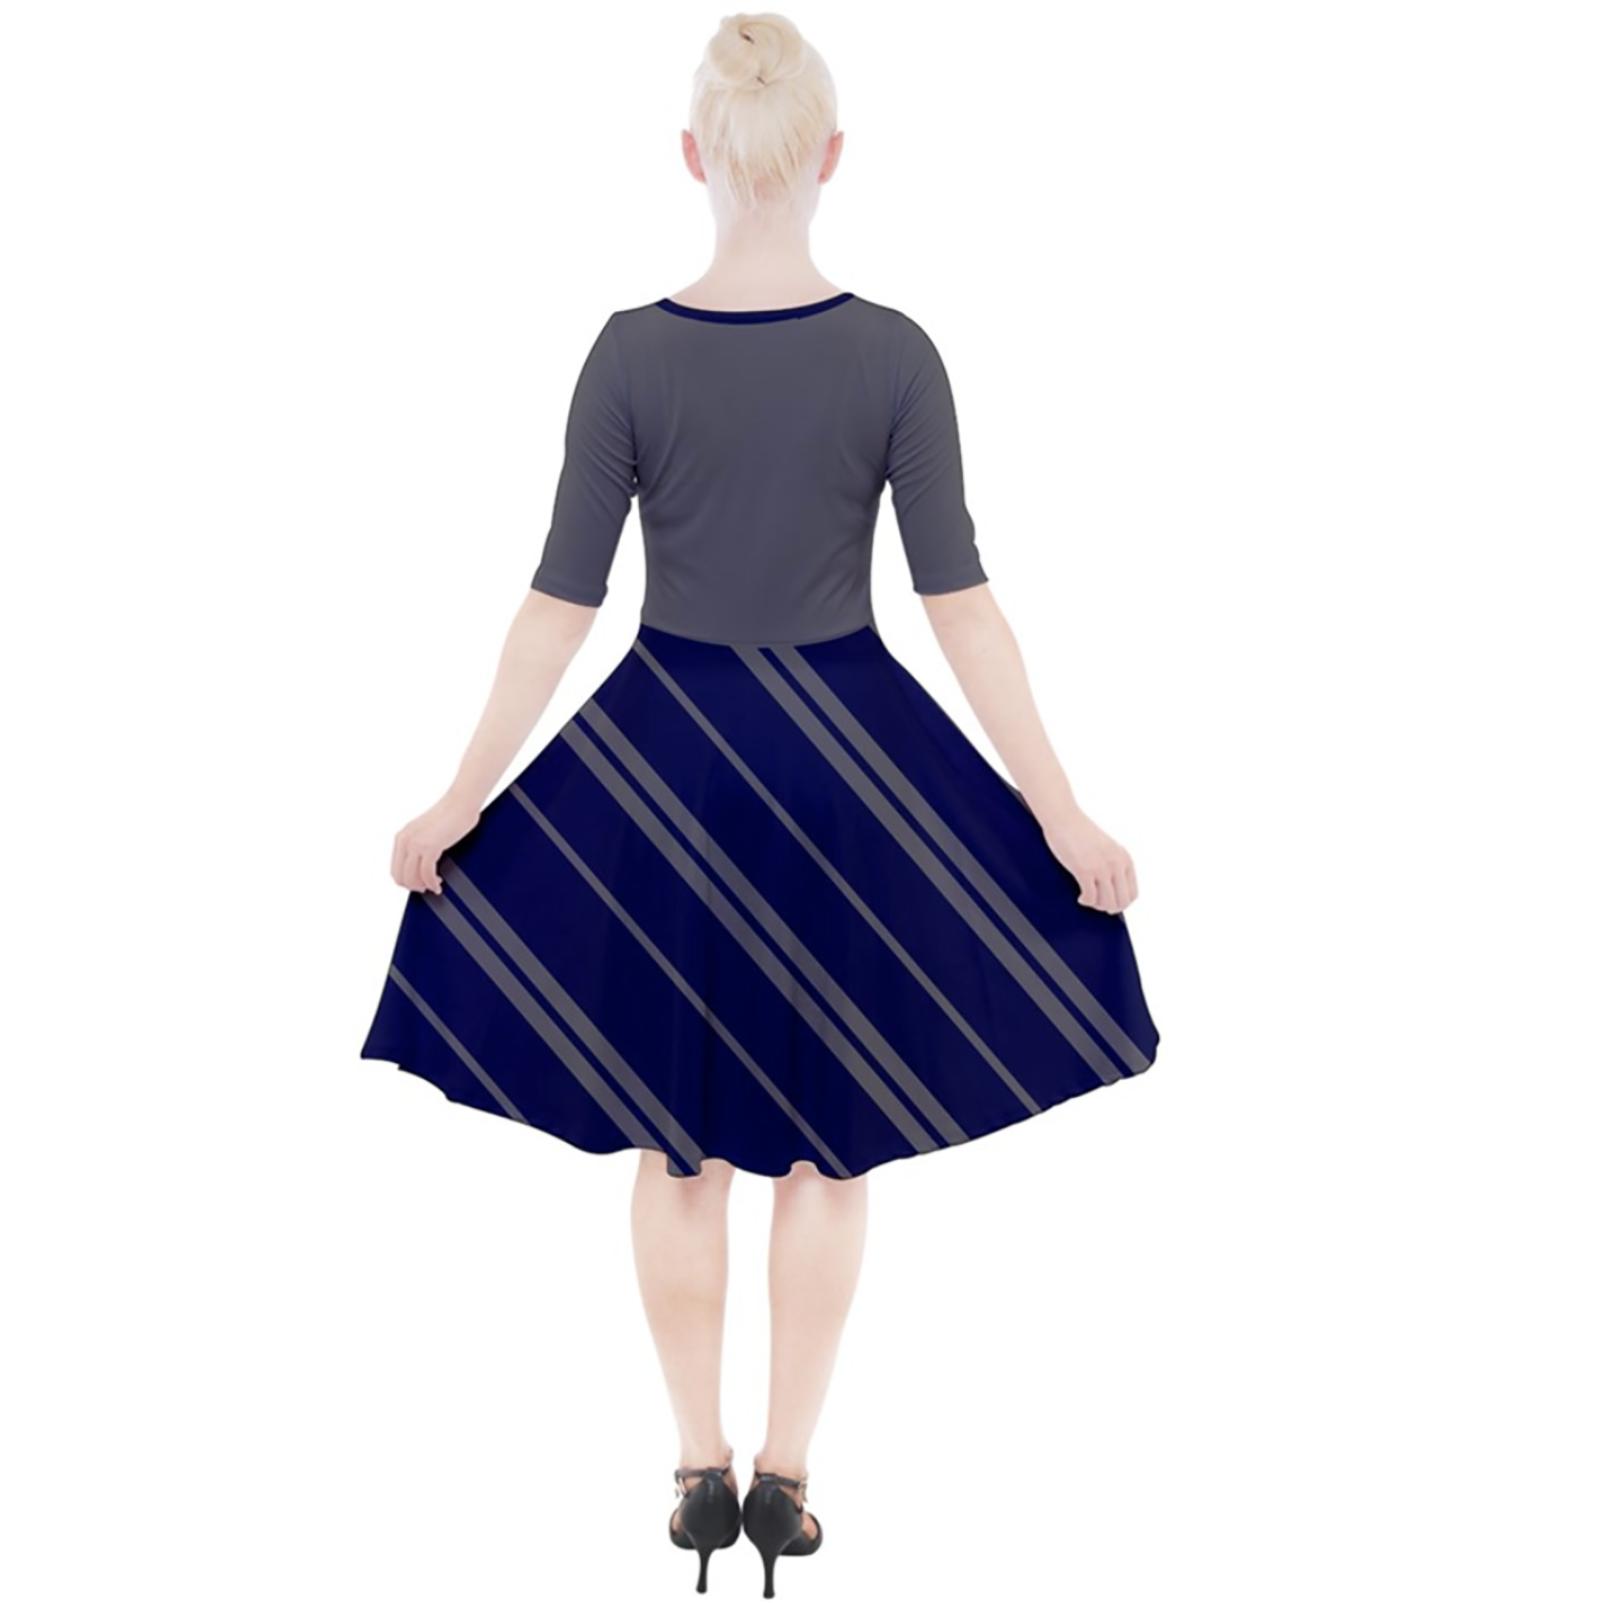 Owl (Blue) Striped Dress - Quarter Sleeve A-Line Dress - Inspired by Ravenclaw